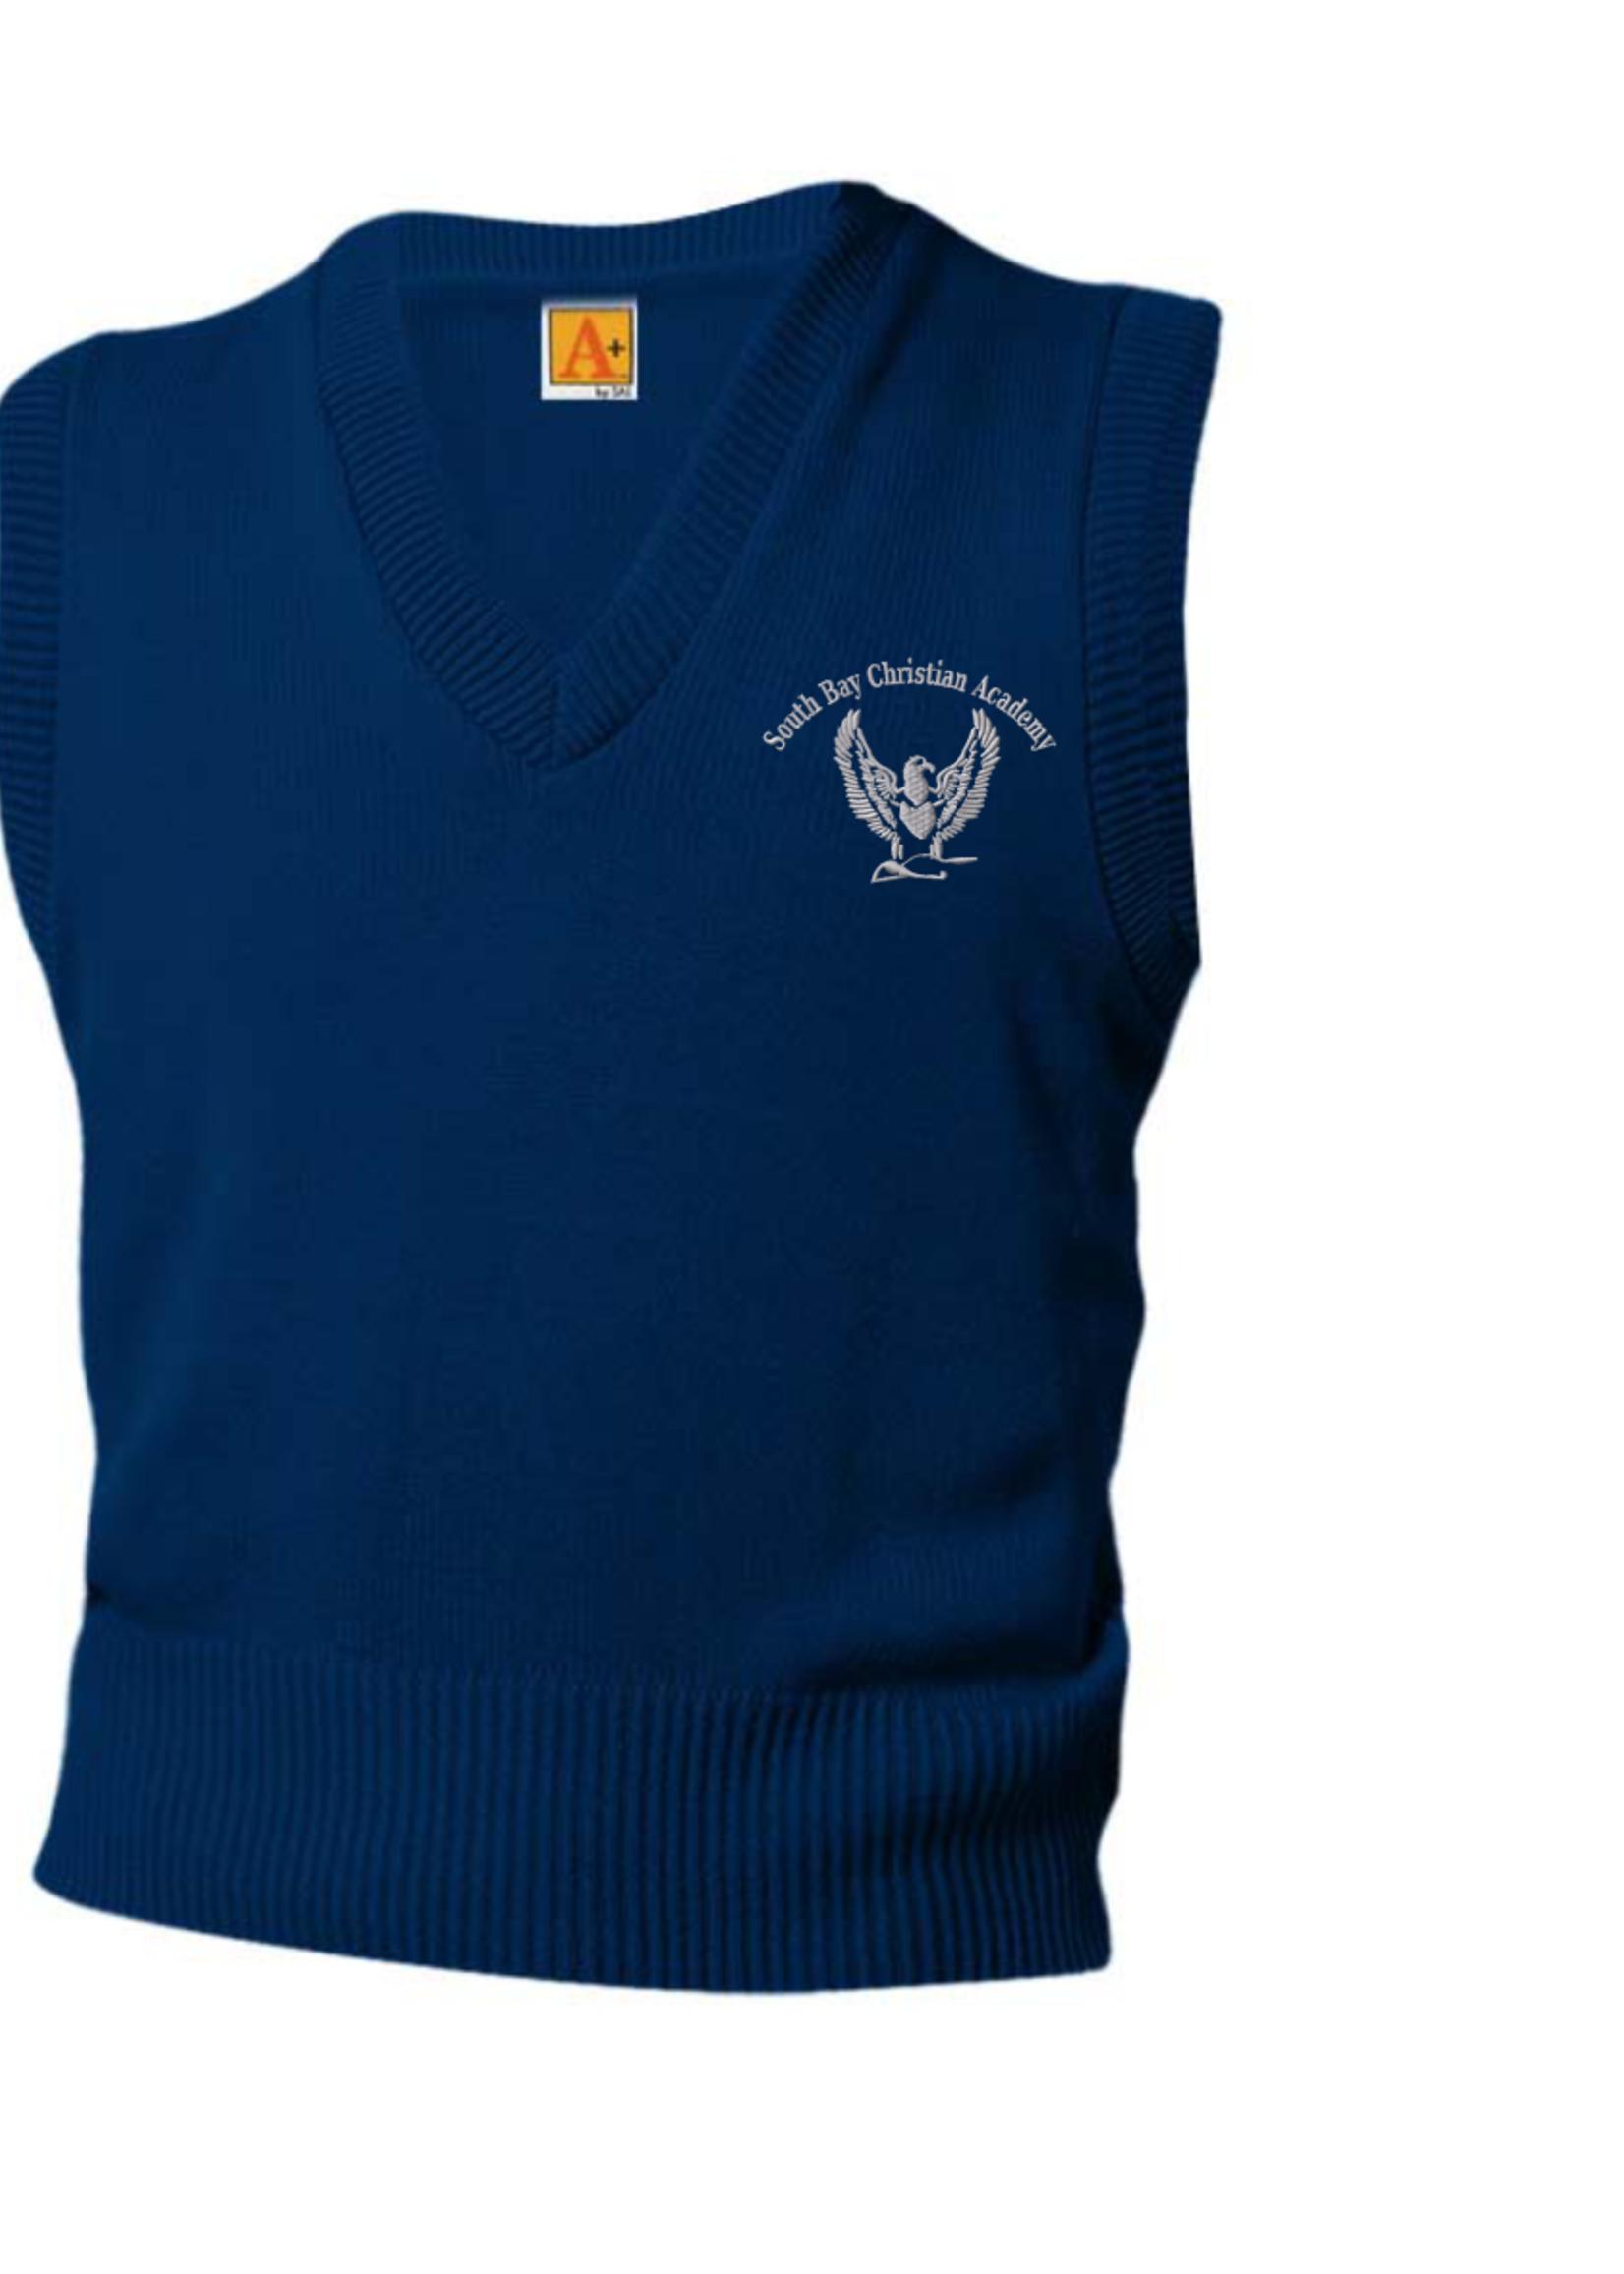 TUS SBCA V-neck sweater vest